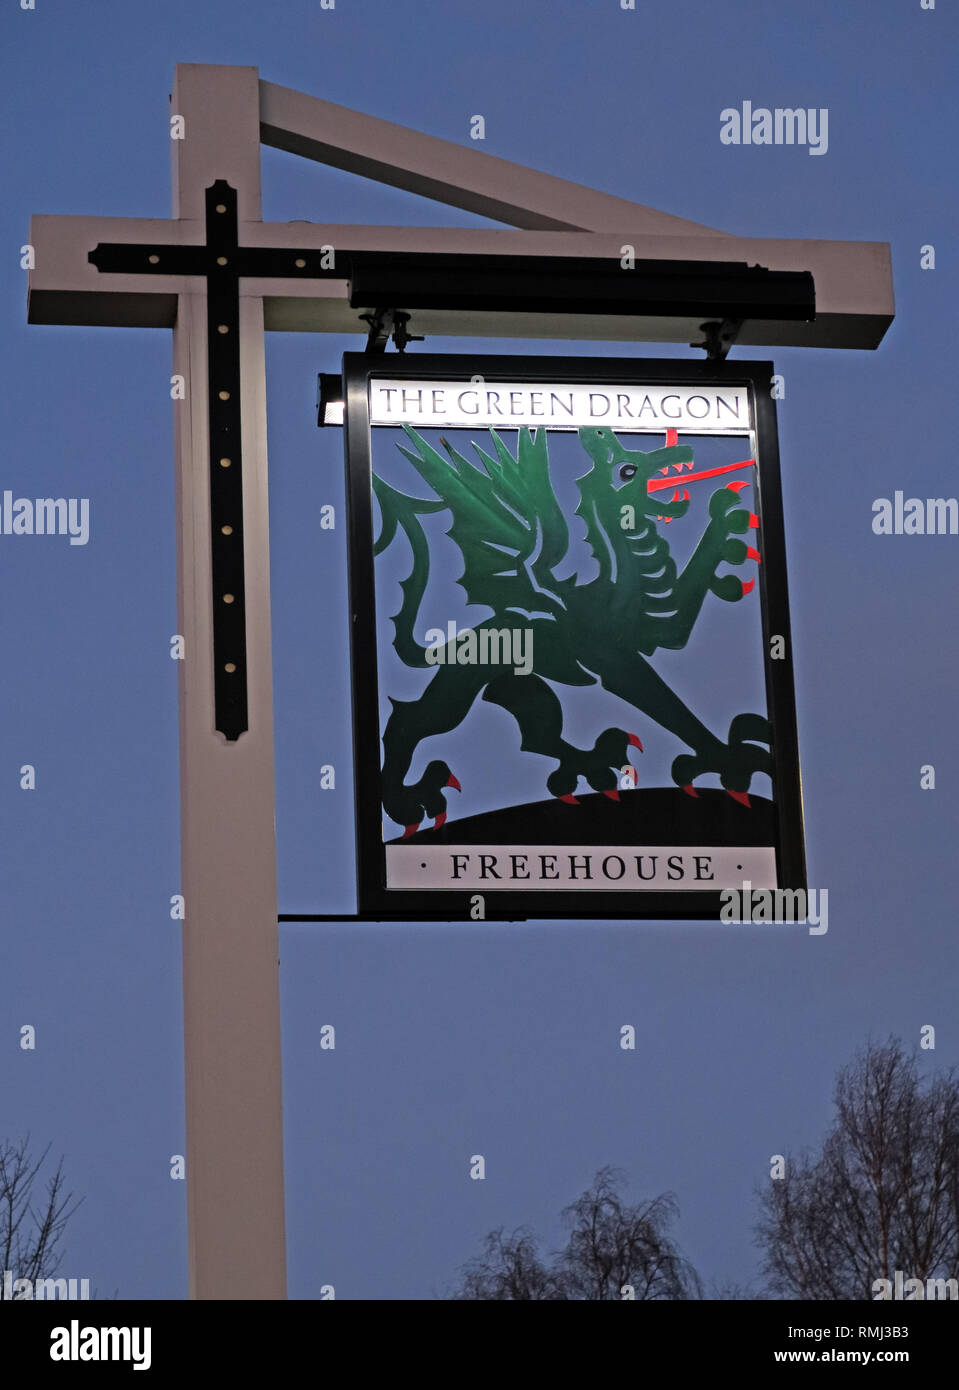 Green Dragon Pub Sign, Vintage Inn, Lymm, Warrington, Cheshire, - Stock Image